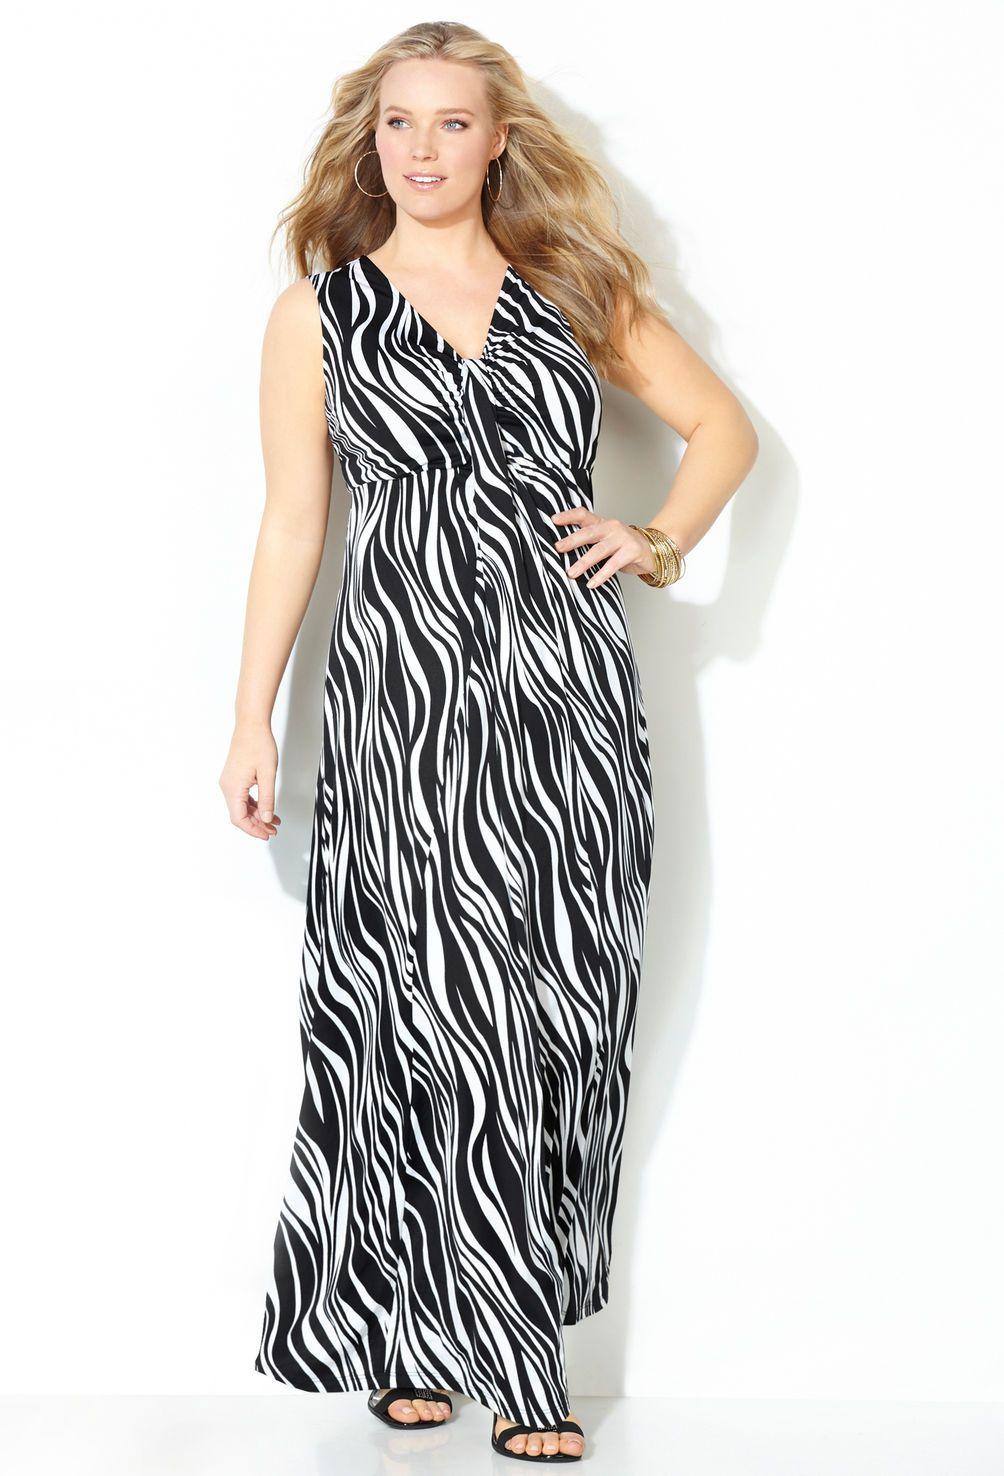 66270ab7061 Zebra Waterfall Maxi Dress-Plus Size Maxi Dress-Avenue